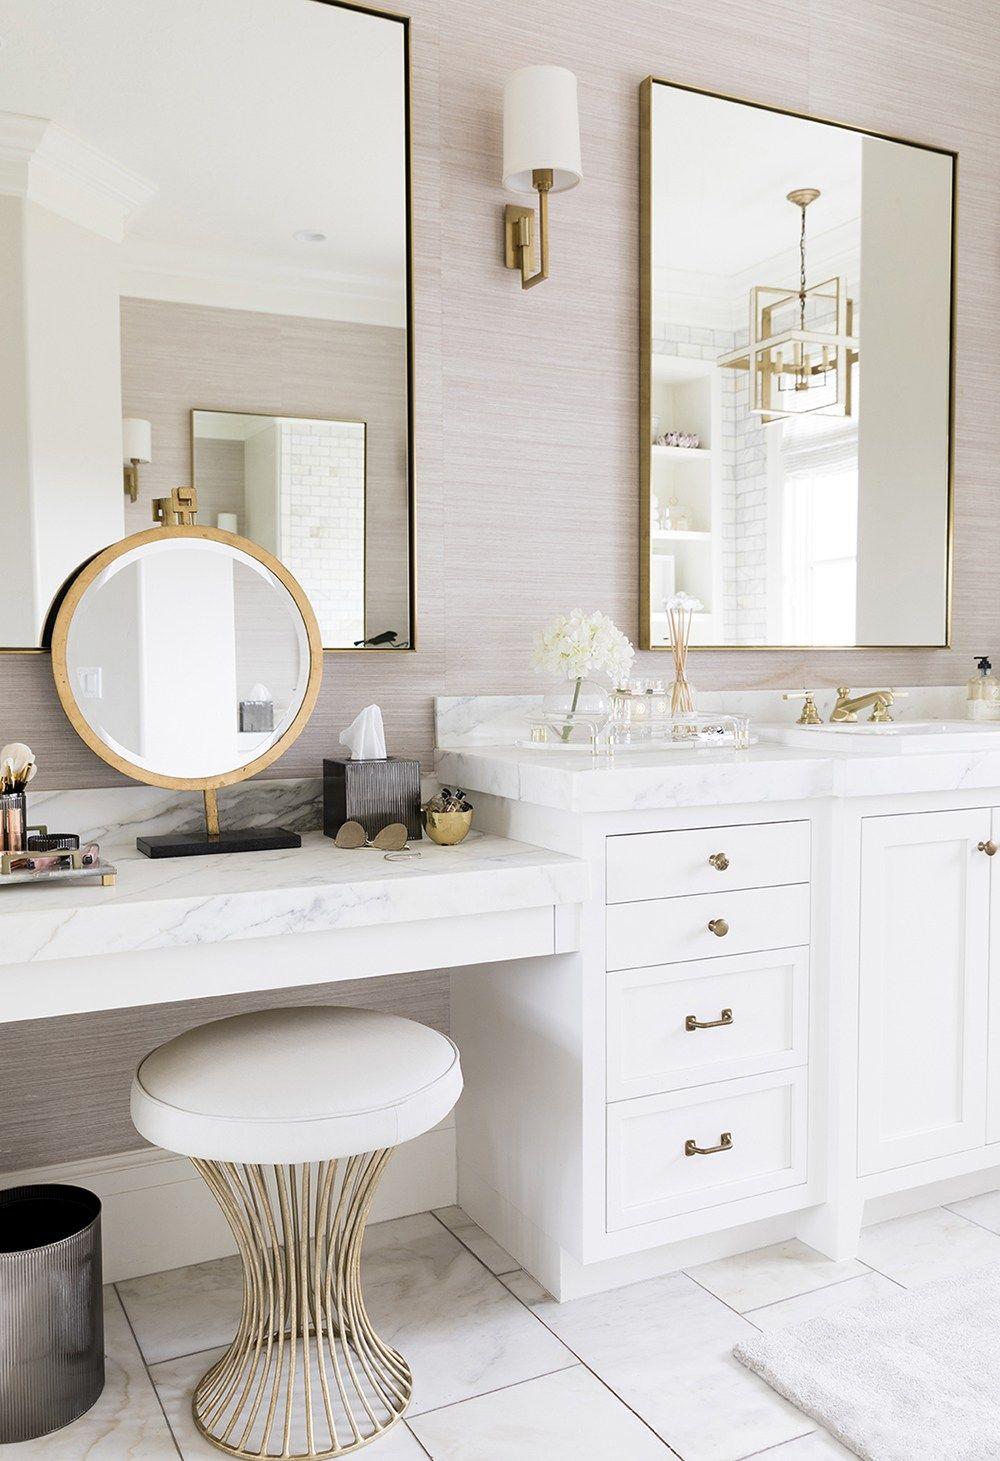 Roundup Waste Baskets Room For Tuesday Blog Bathroom Interior Design Master Bathroom Design Bathroom Vanity Designs [ jpg ]